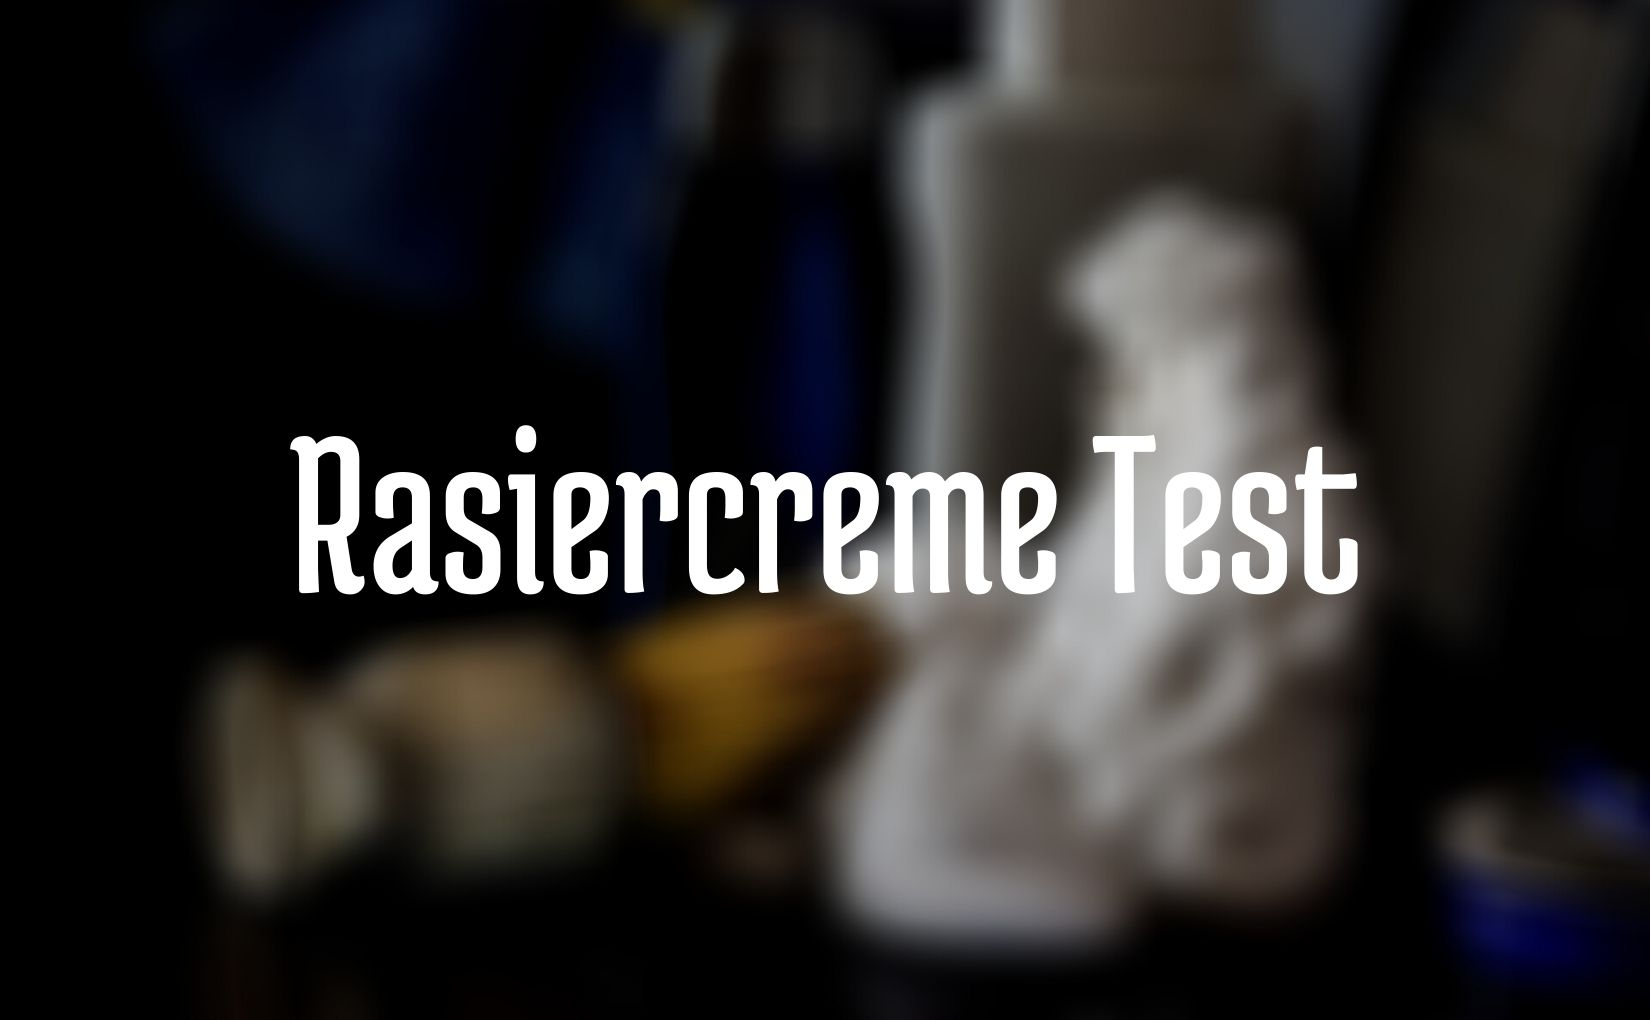 Rasiercreme Test